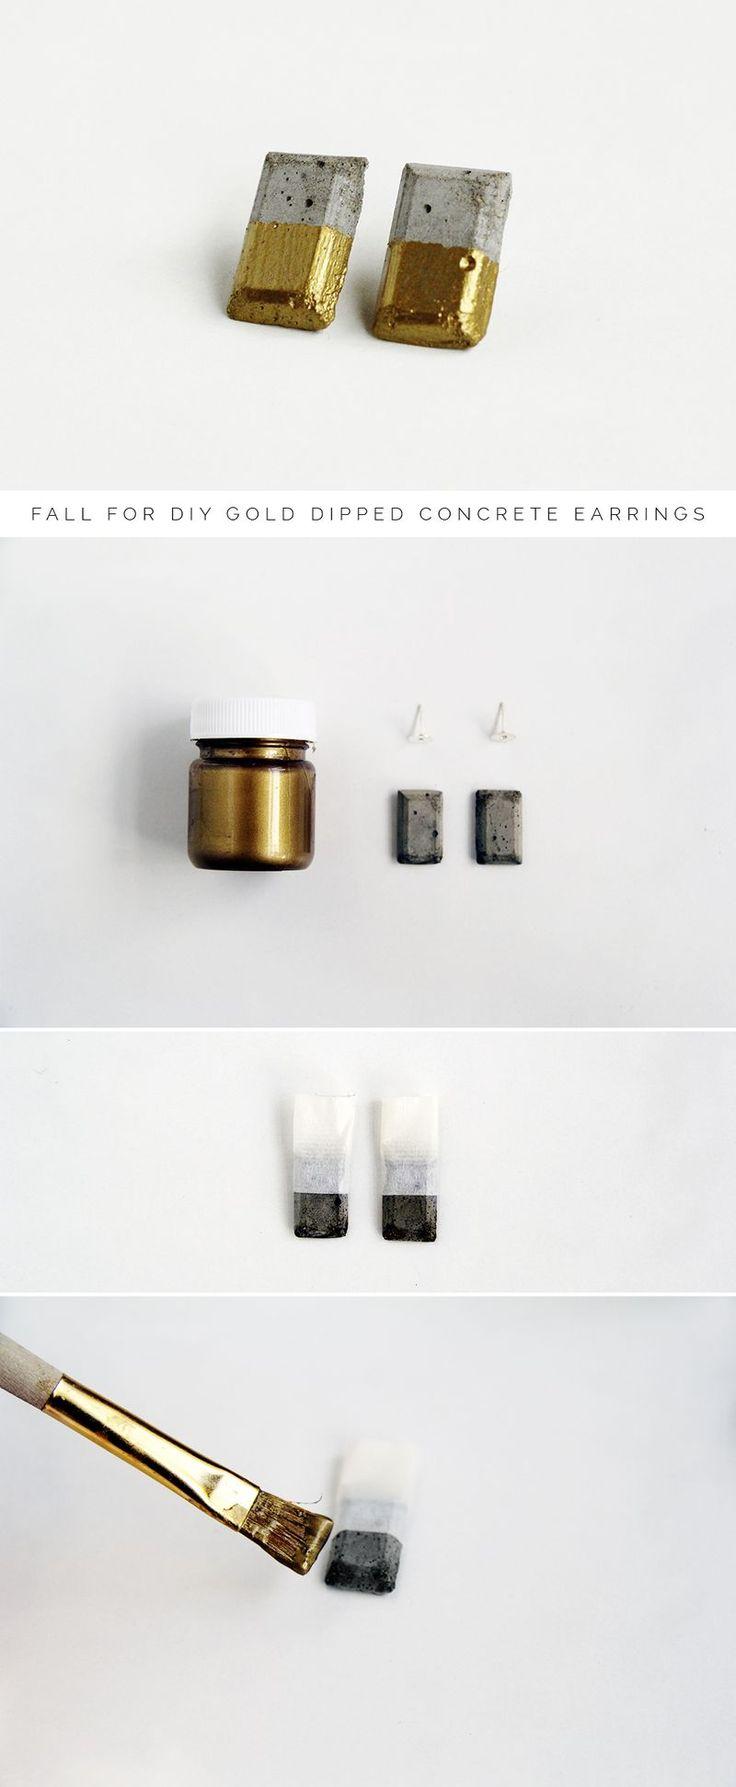 DIY Gold Dipped Concrete Earrings Tutorial